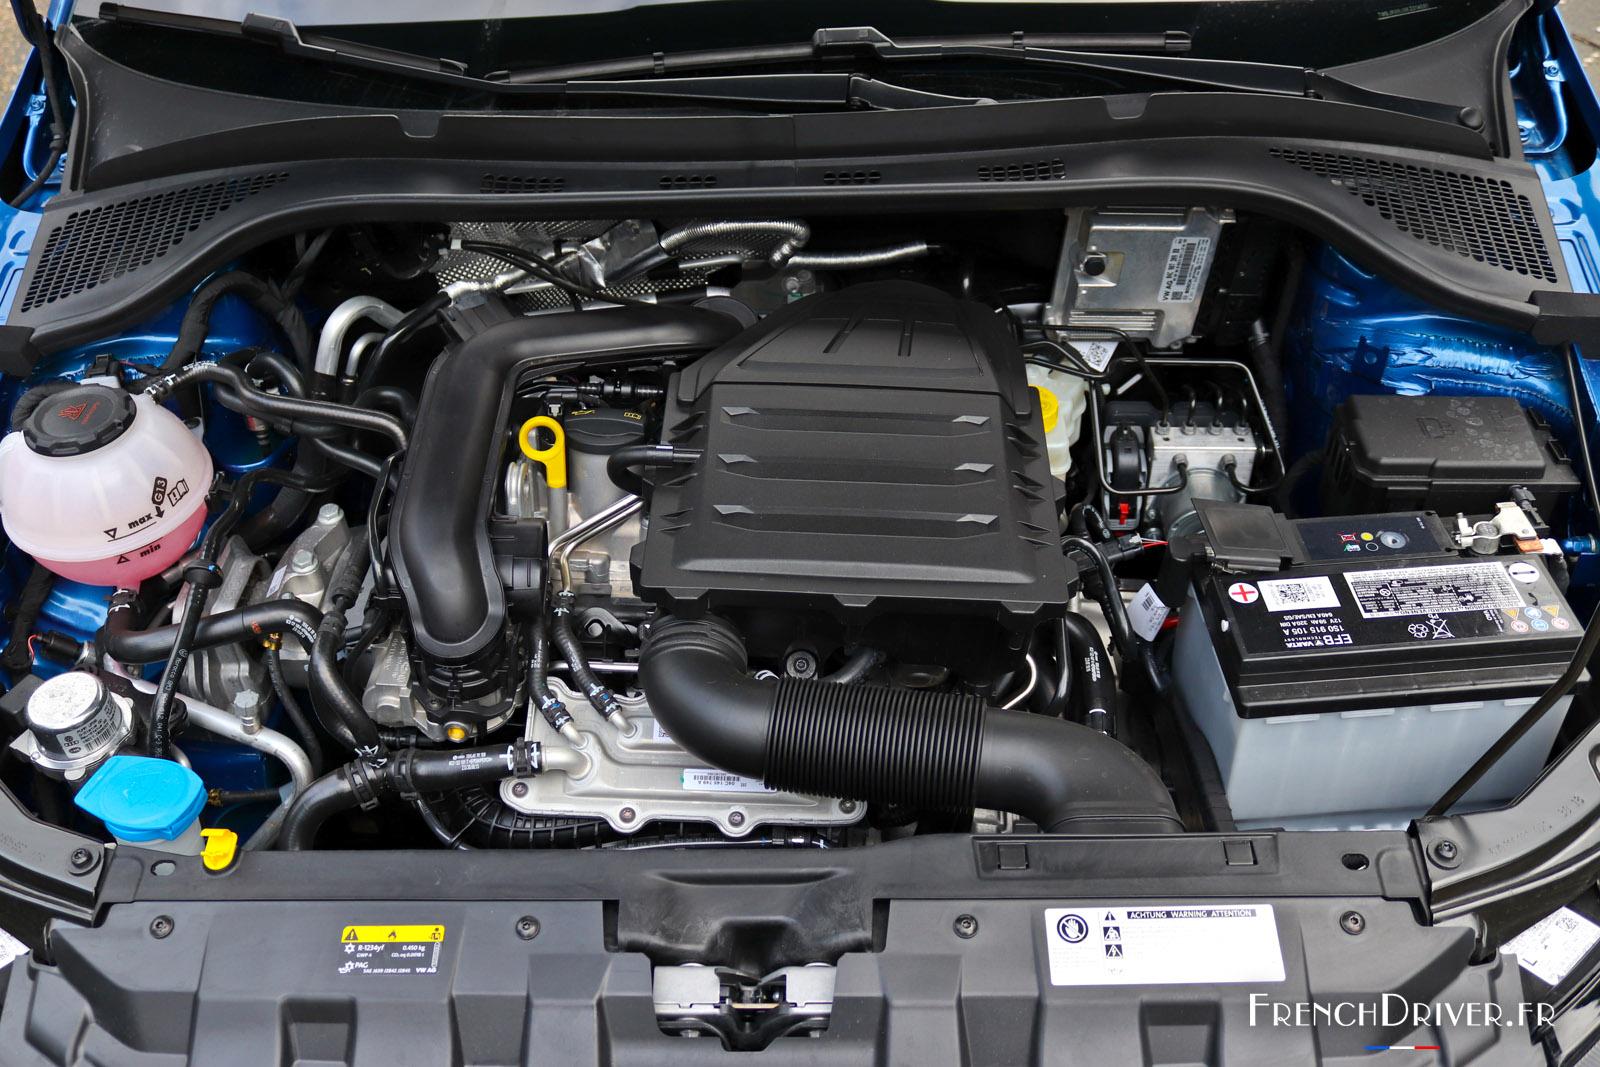 Autoskoda Ef Bf Bdkoda Fabia Remise C3 A0 Niveau Pour Le Break Compact Essai Skoda Fabia Tsi 110 Dsg7 La Bien Elevee